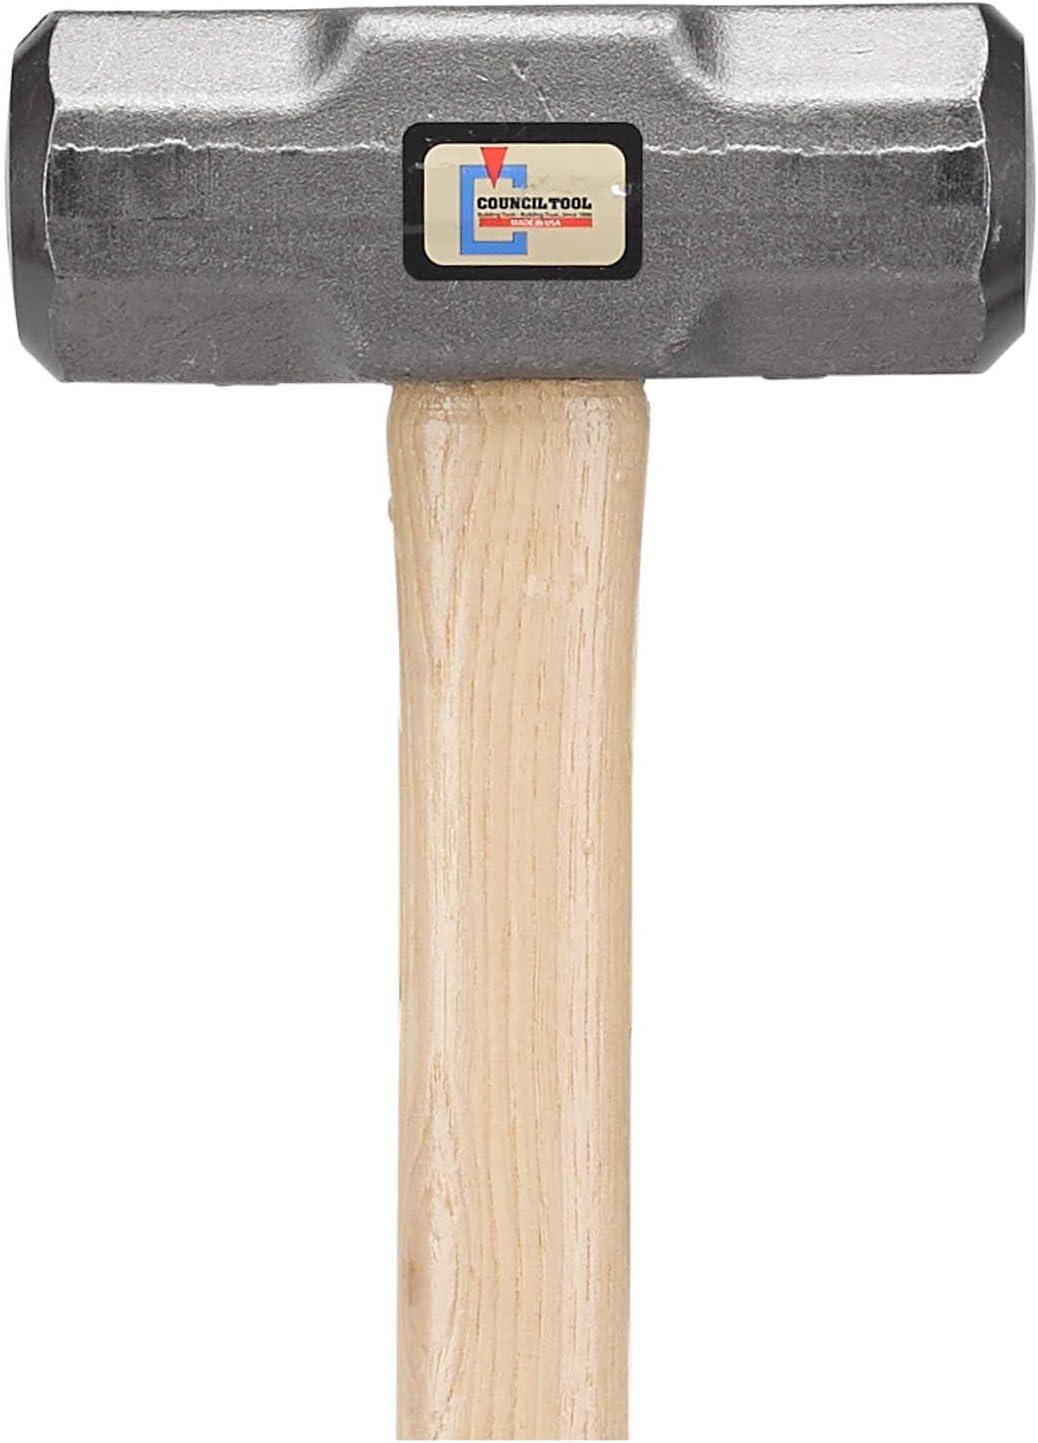 SALENEW very popular! Council Sledgehammer 8 lb. handle head Tulsa Mall hickory 36